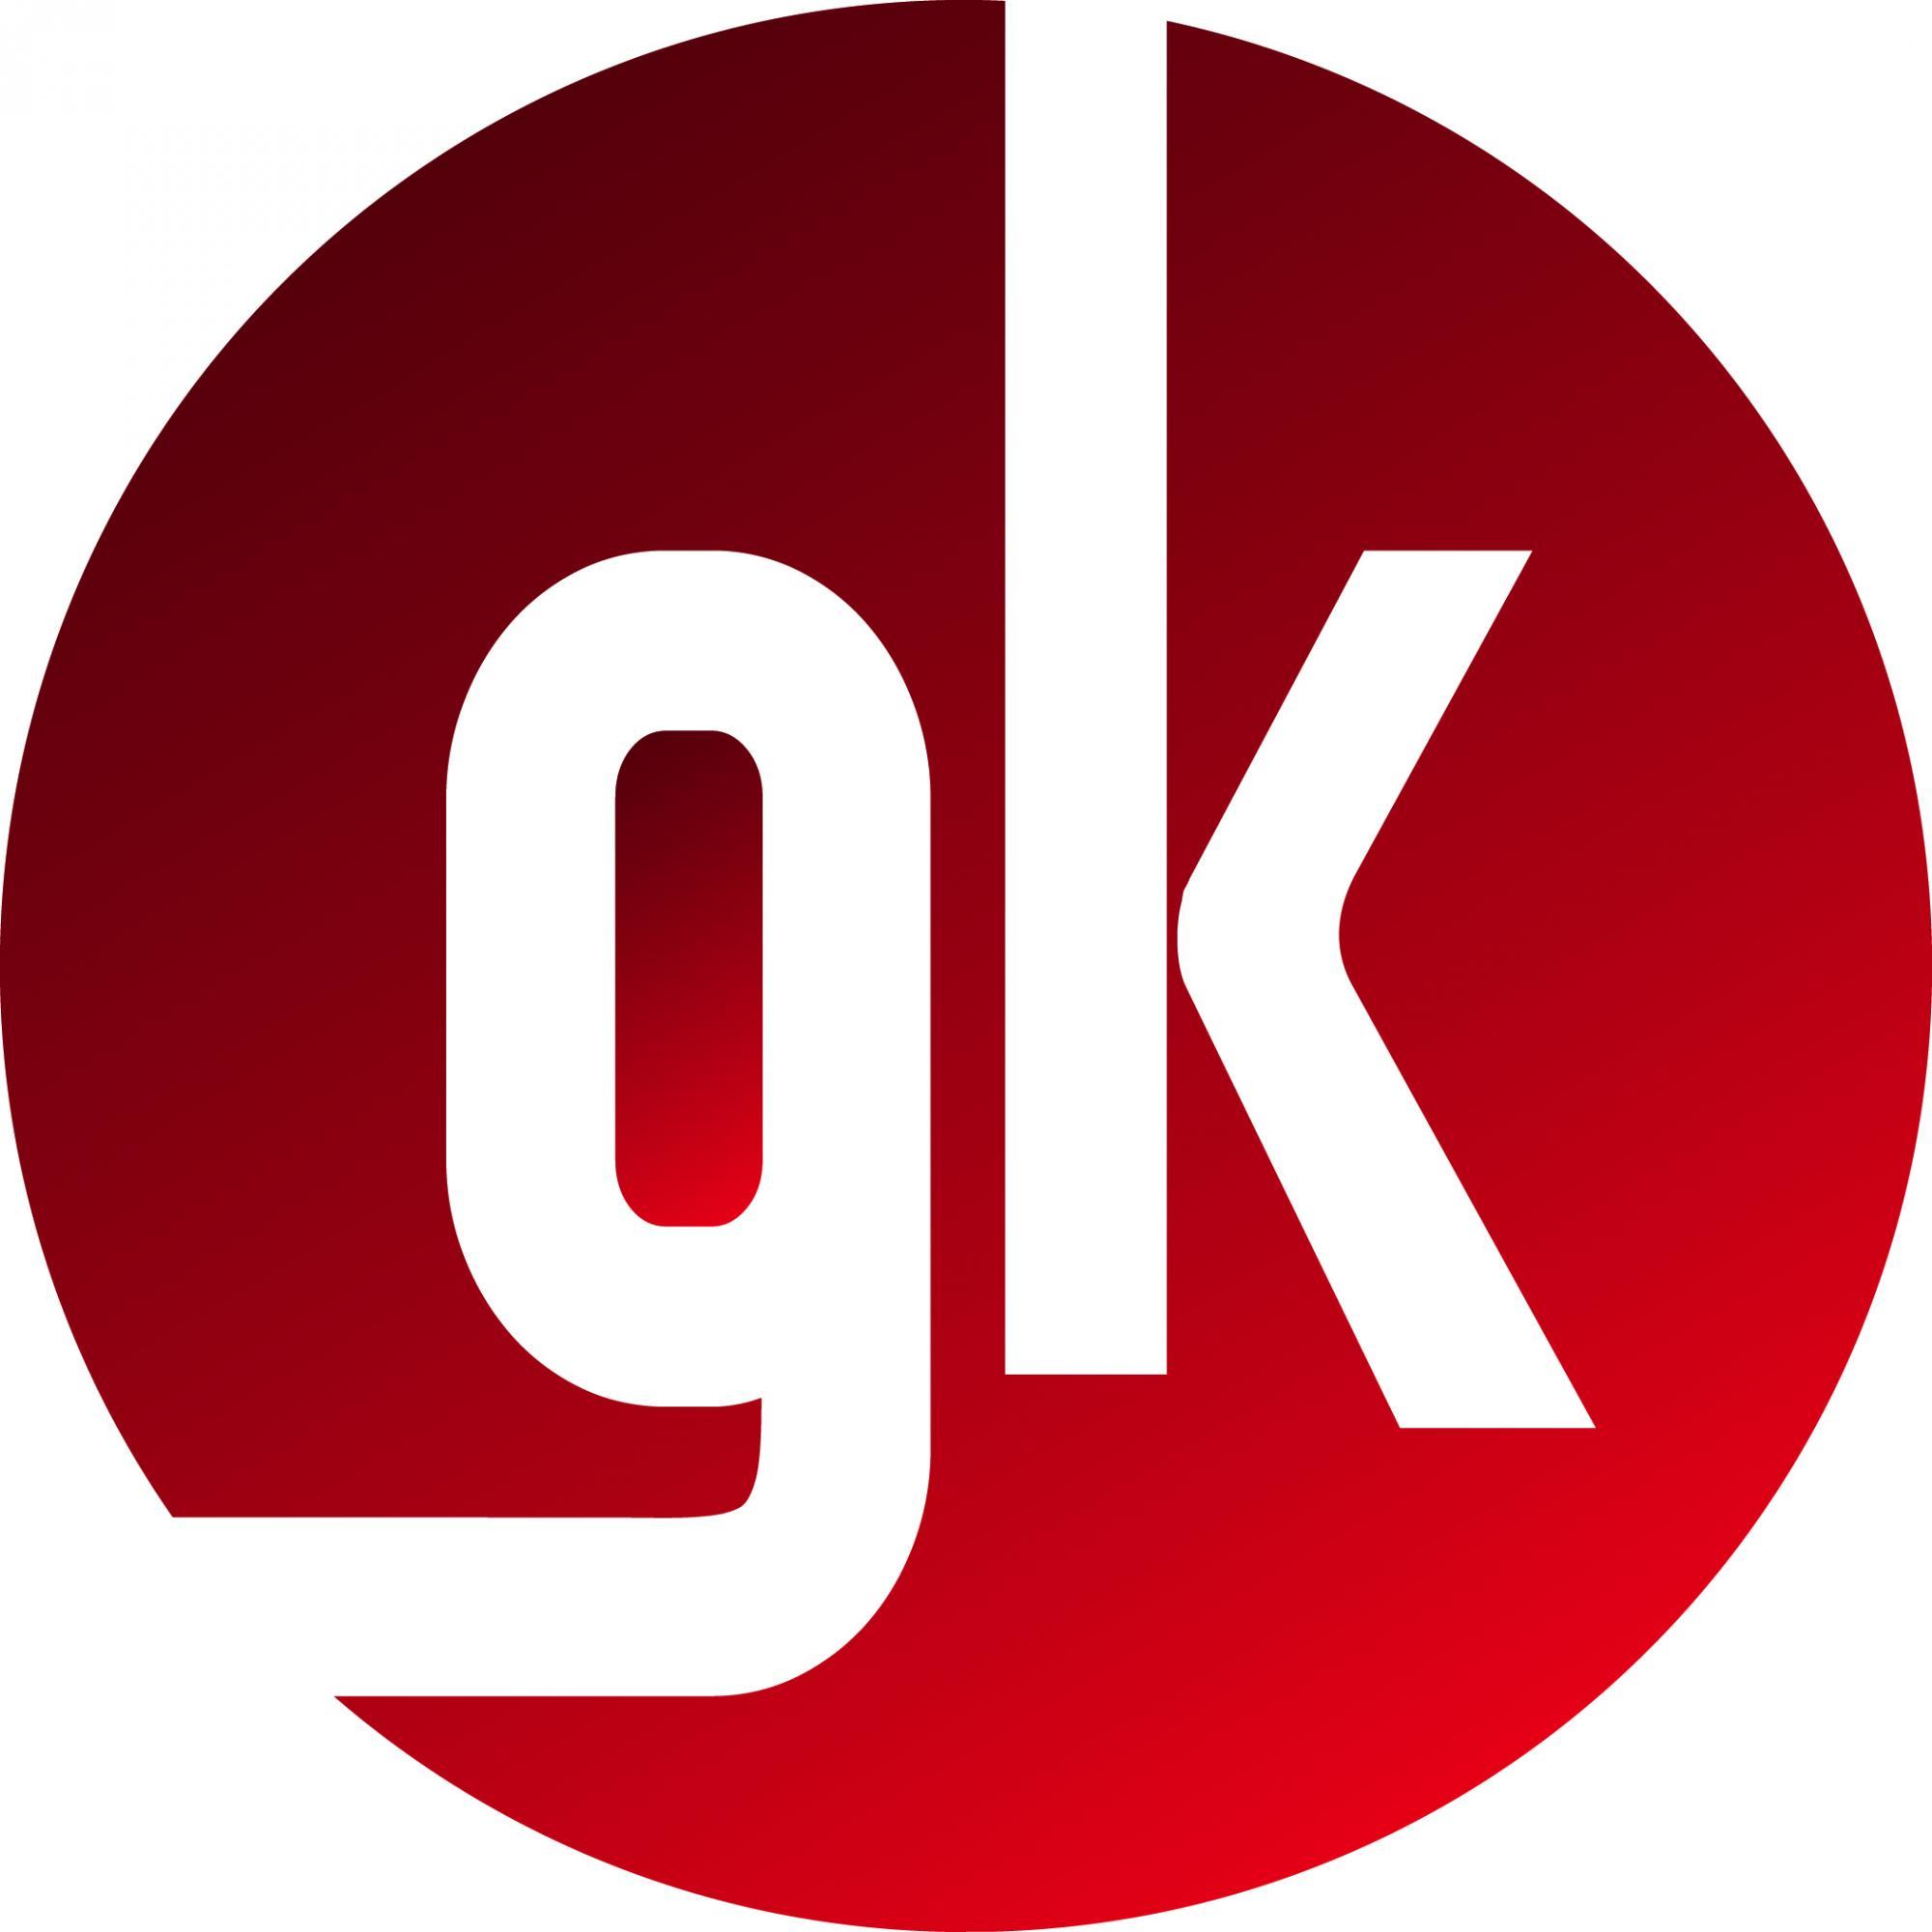 gk logo gk india today rh gkindiatoday com g logo g logo